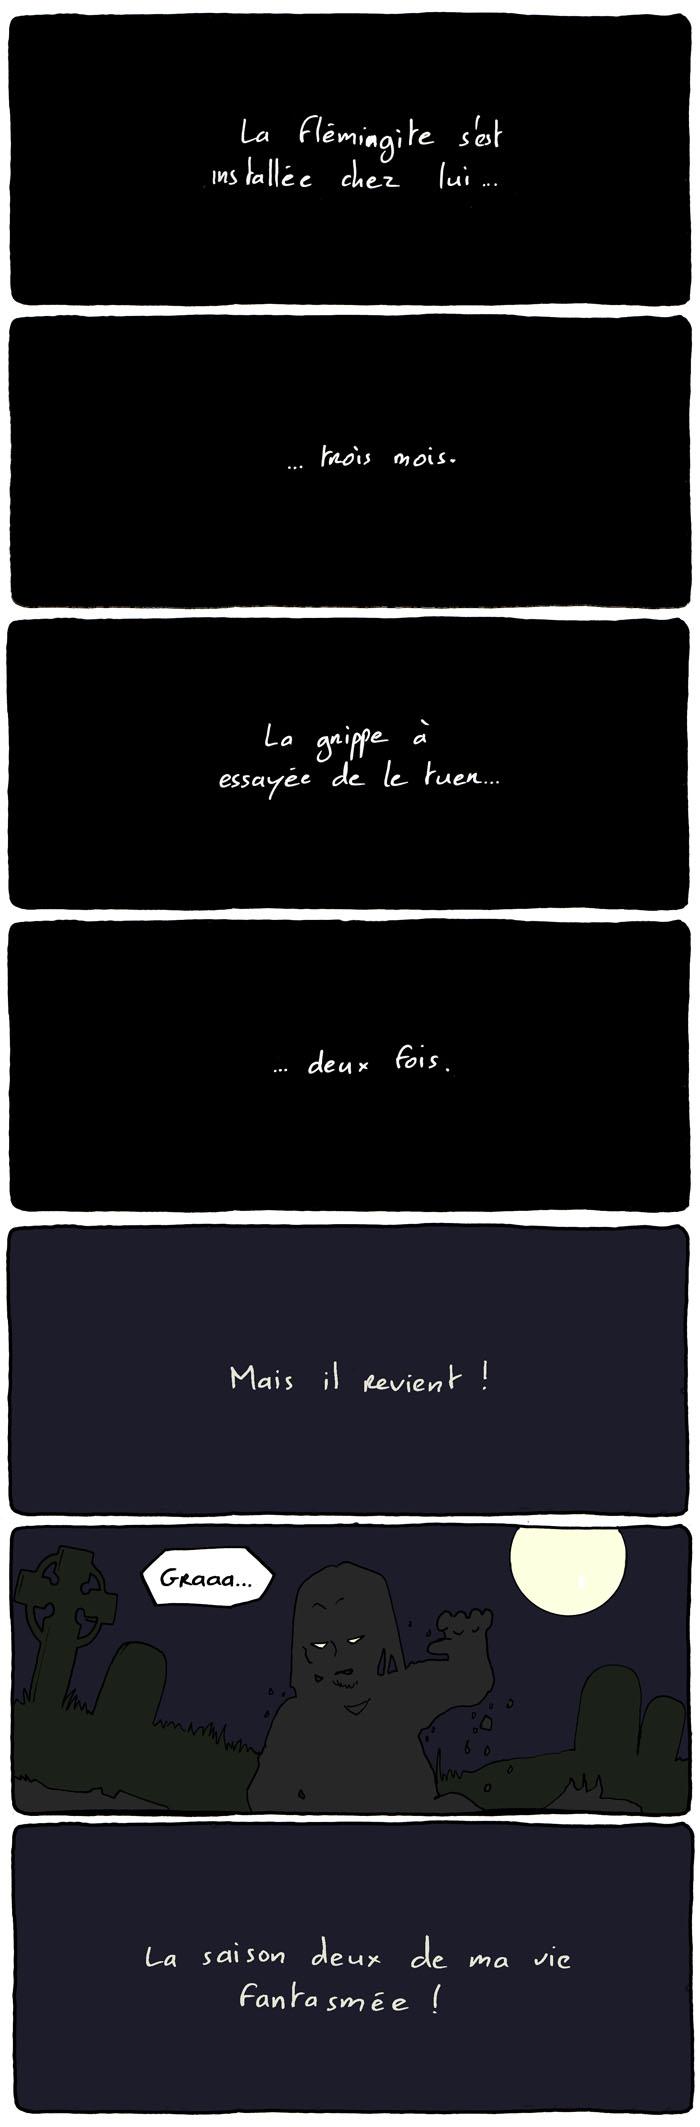 http://bjouen.free.fr/dessins/graaa%20021.jpg